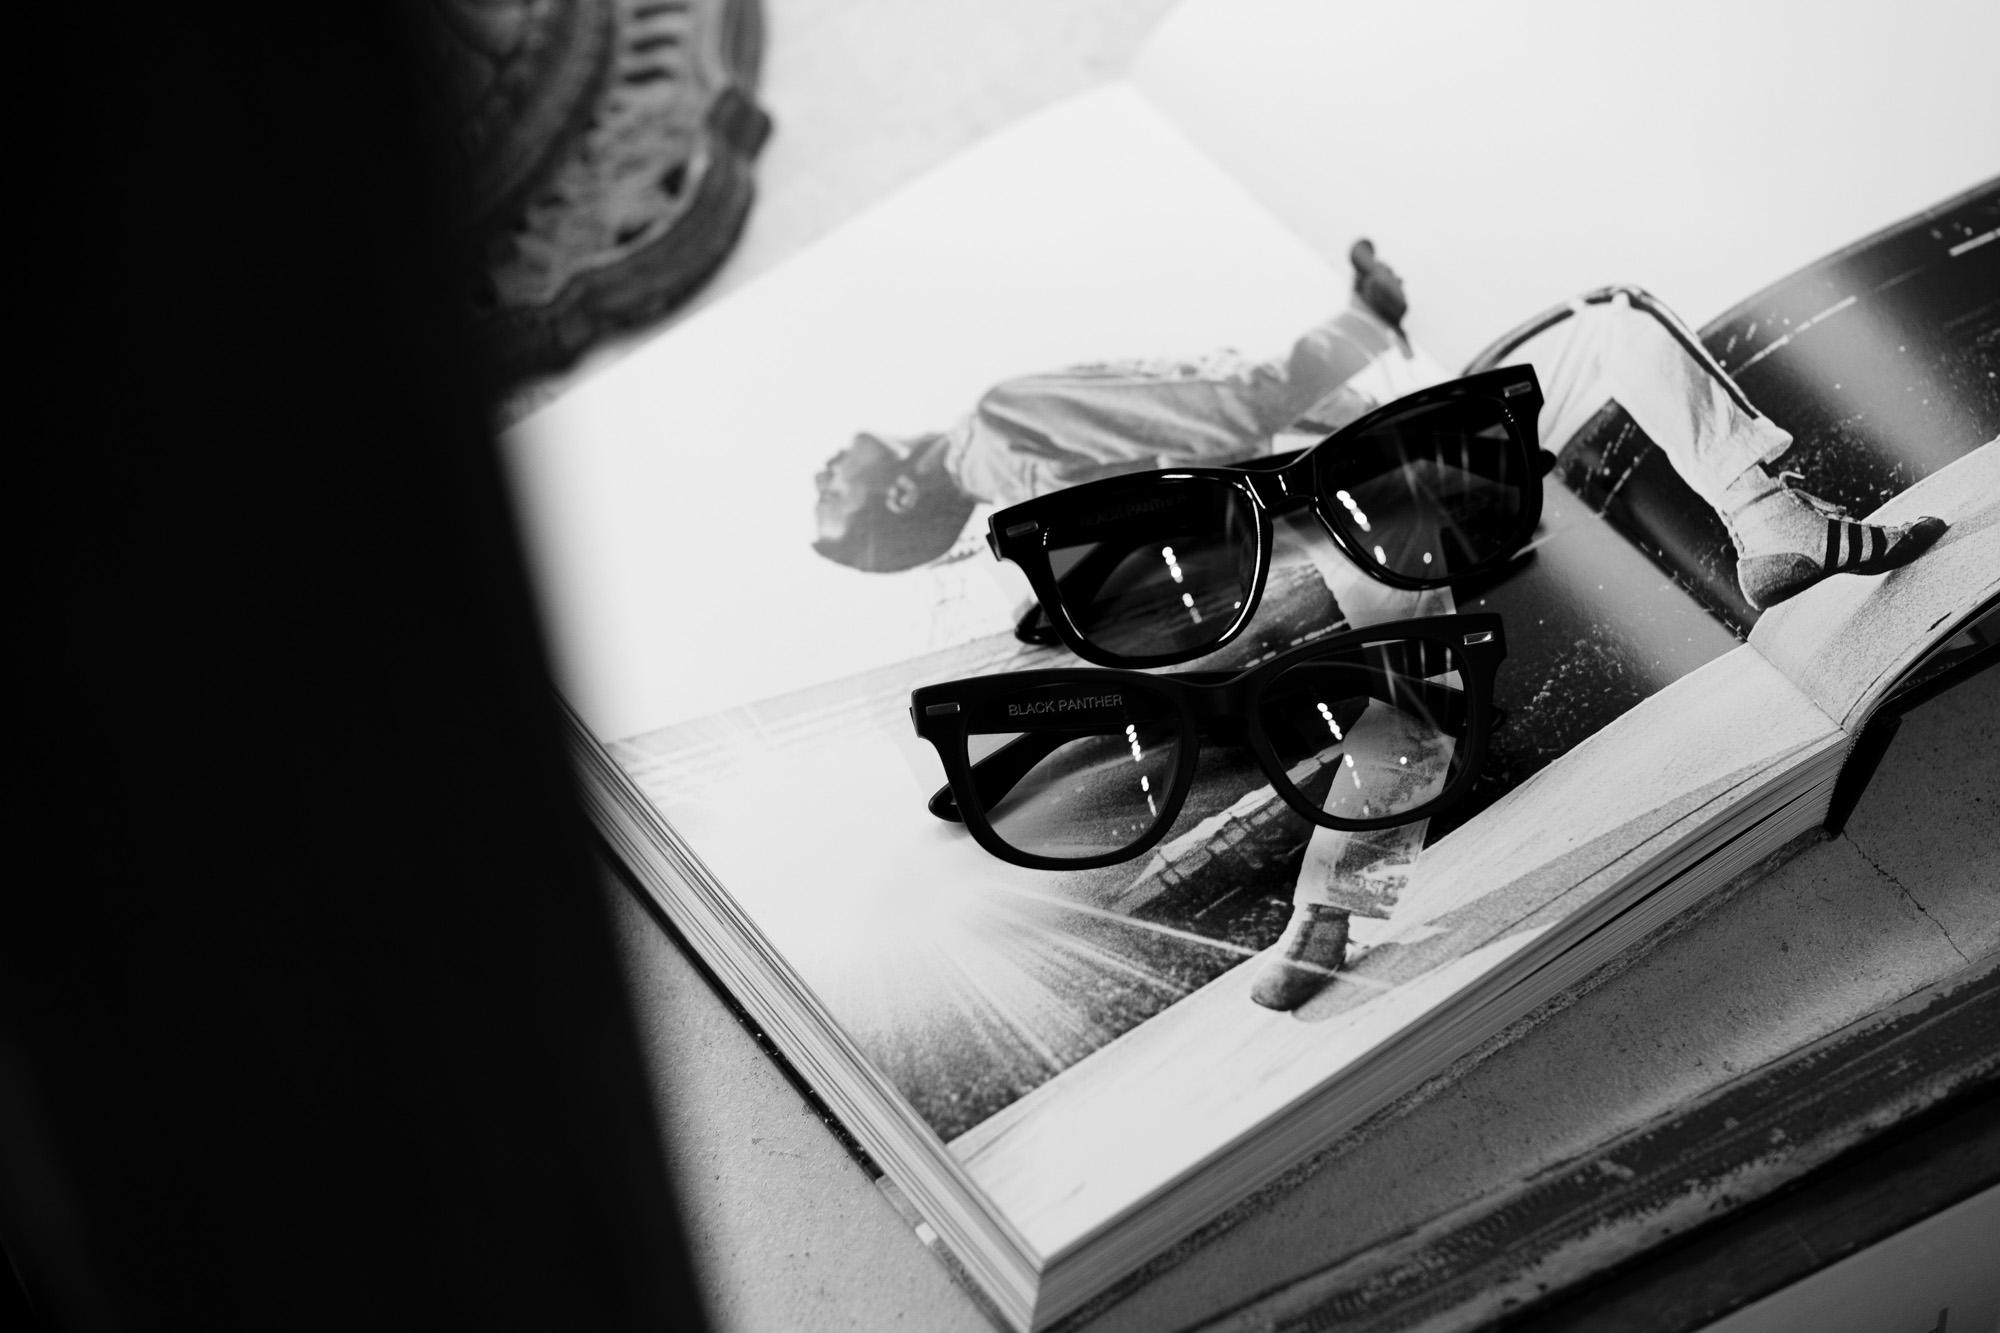 FIXER BLACK PANTHER 925 STERLING SILVER サングラス MATTE BLACK × LIGHT GRAY /// FIXER BLACK PANTHER 925 STERLING SILVER サングラス BLACK × BLACK SMOKE フィクサー ブラックパンサー 925シルバー マットブラック ライトグレー 愛知 名古屋 Alto e Diritto altoediritto アルトエデリット 眼鏡 アイウエア